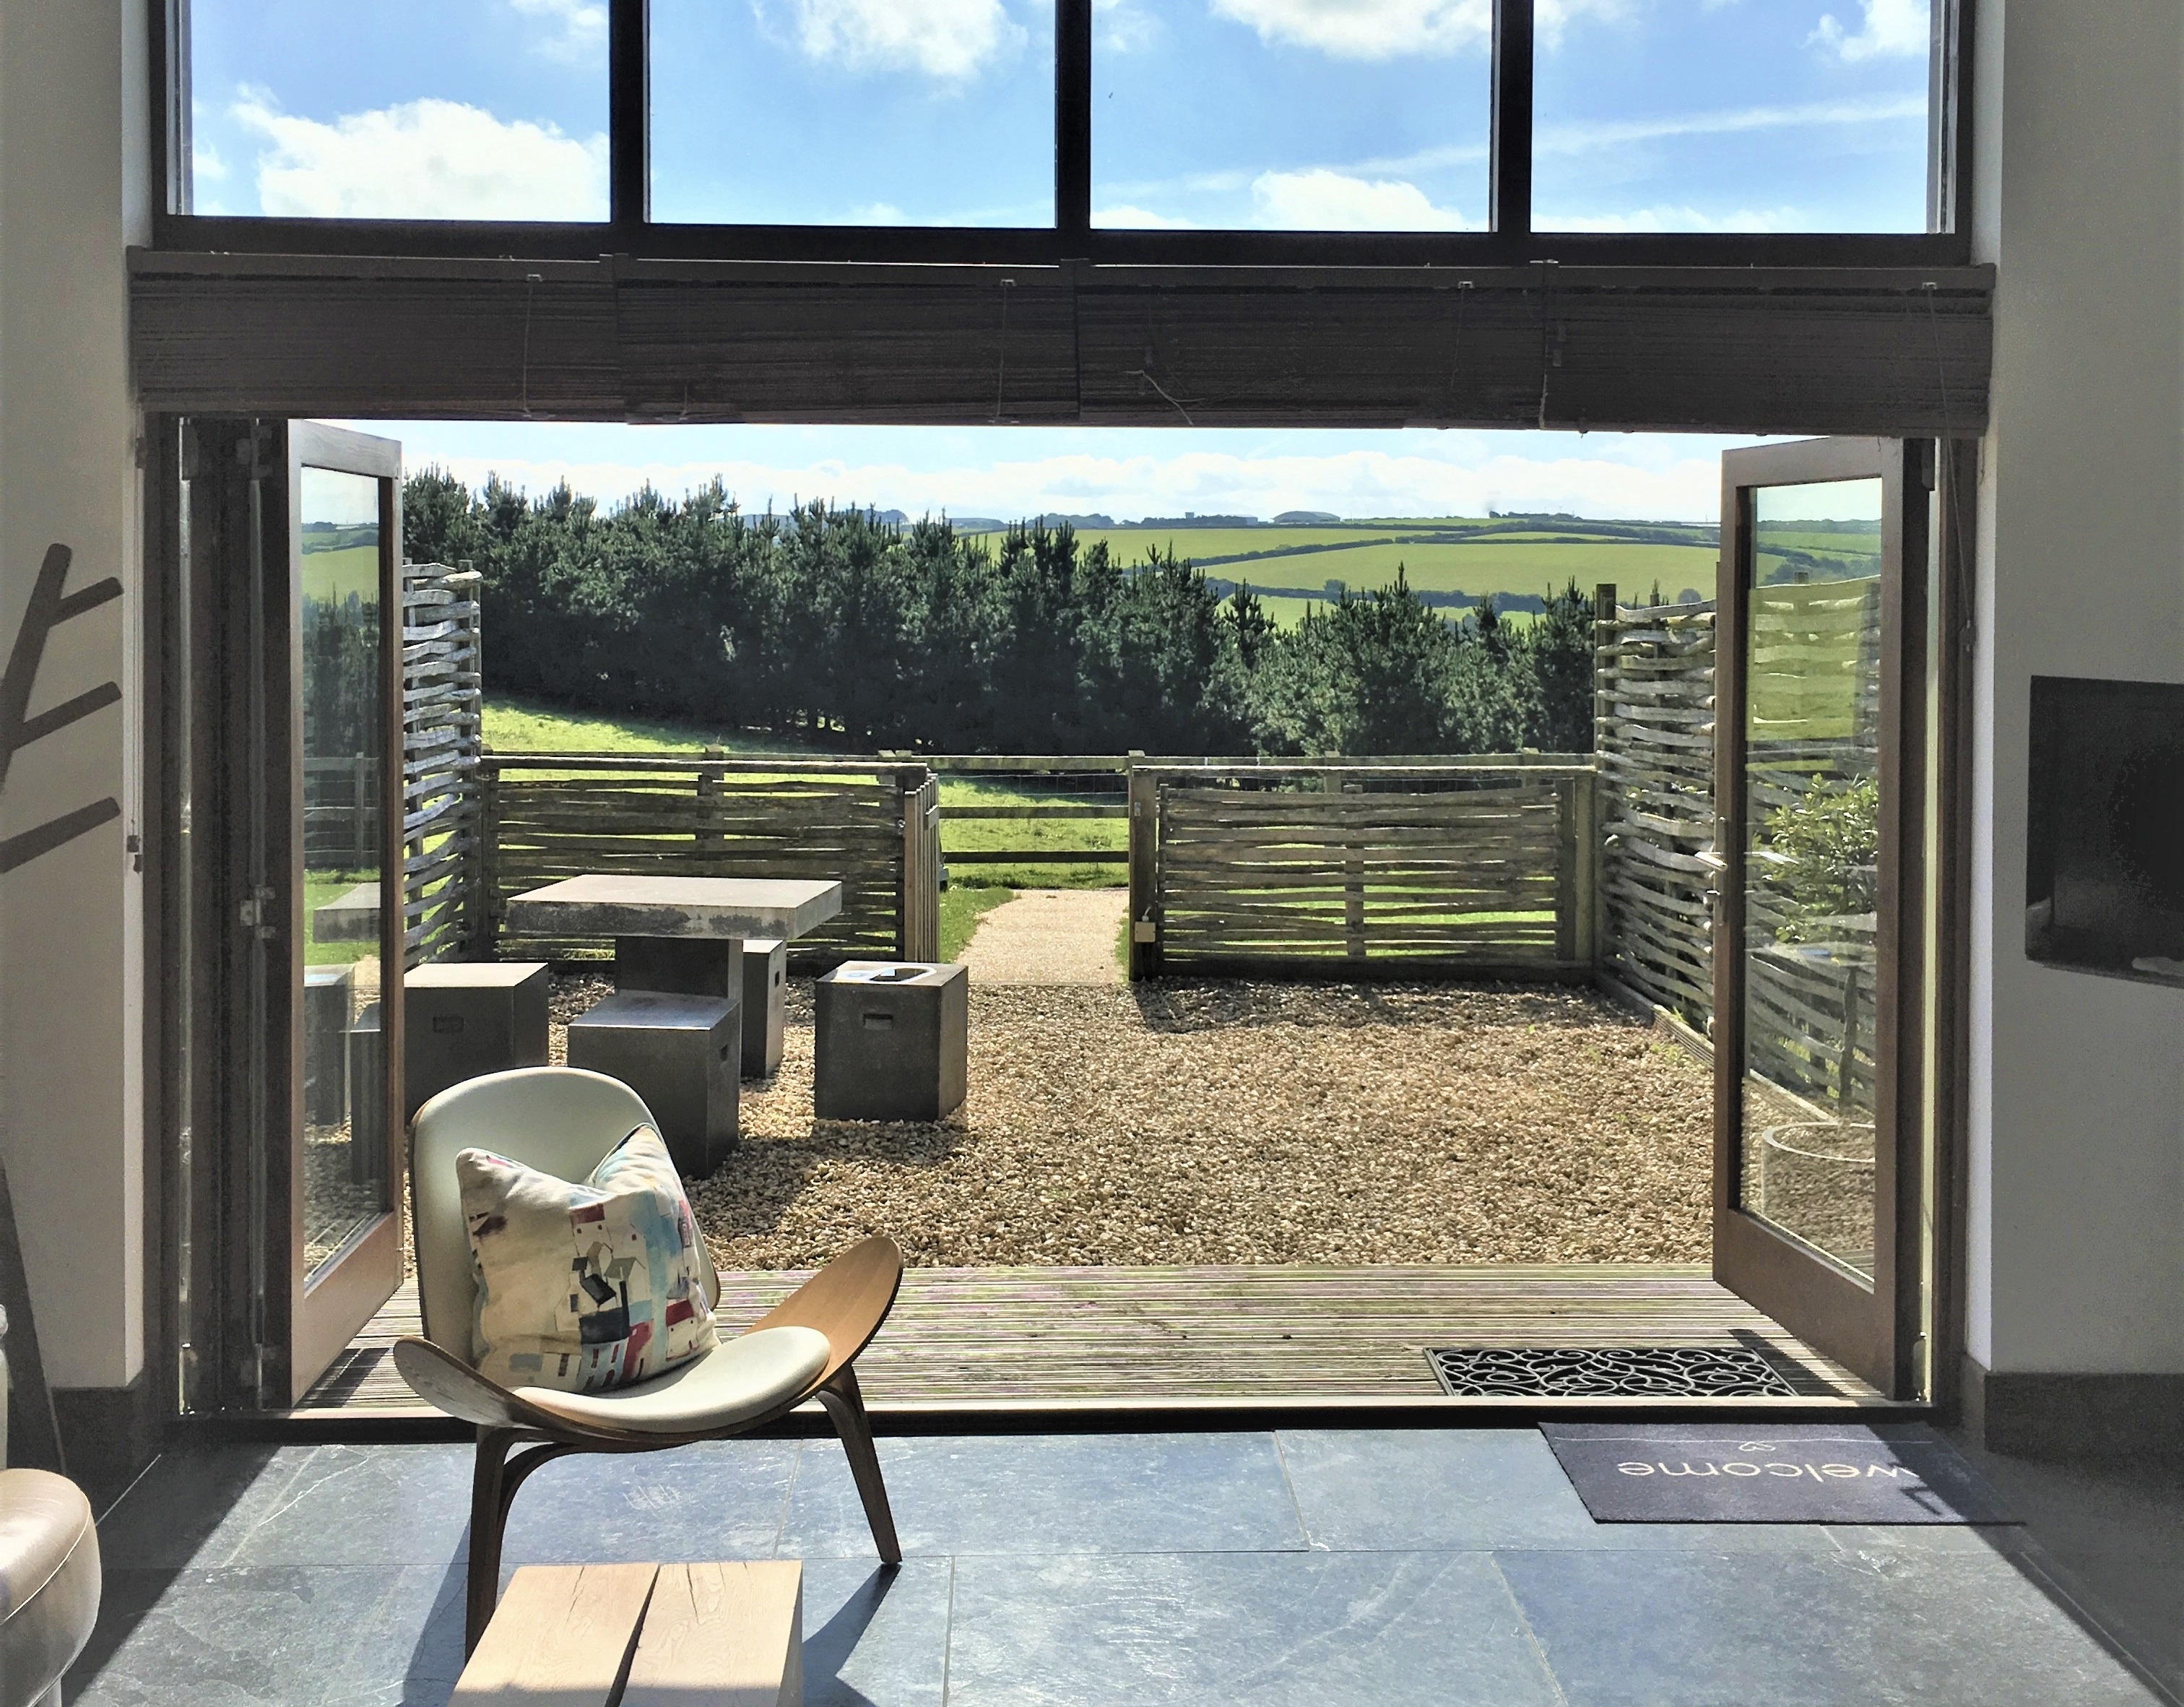 Merlin Farm - Gallery